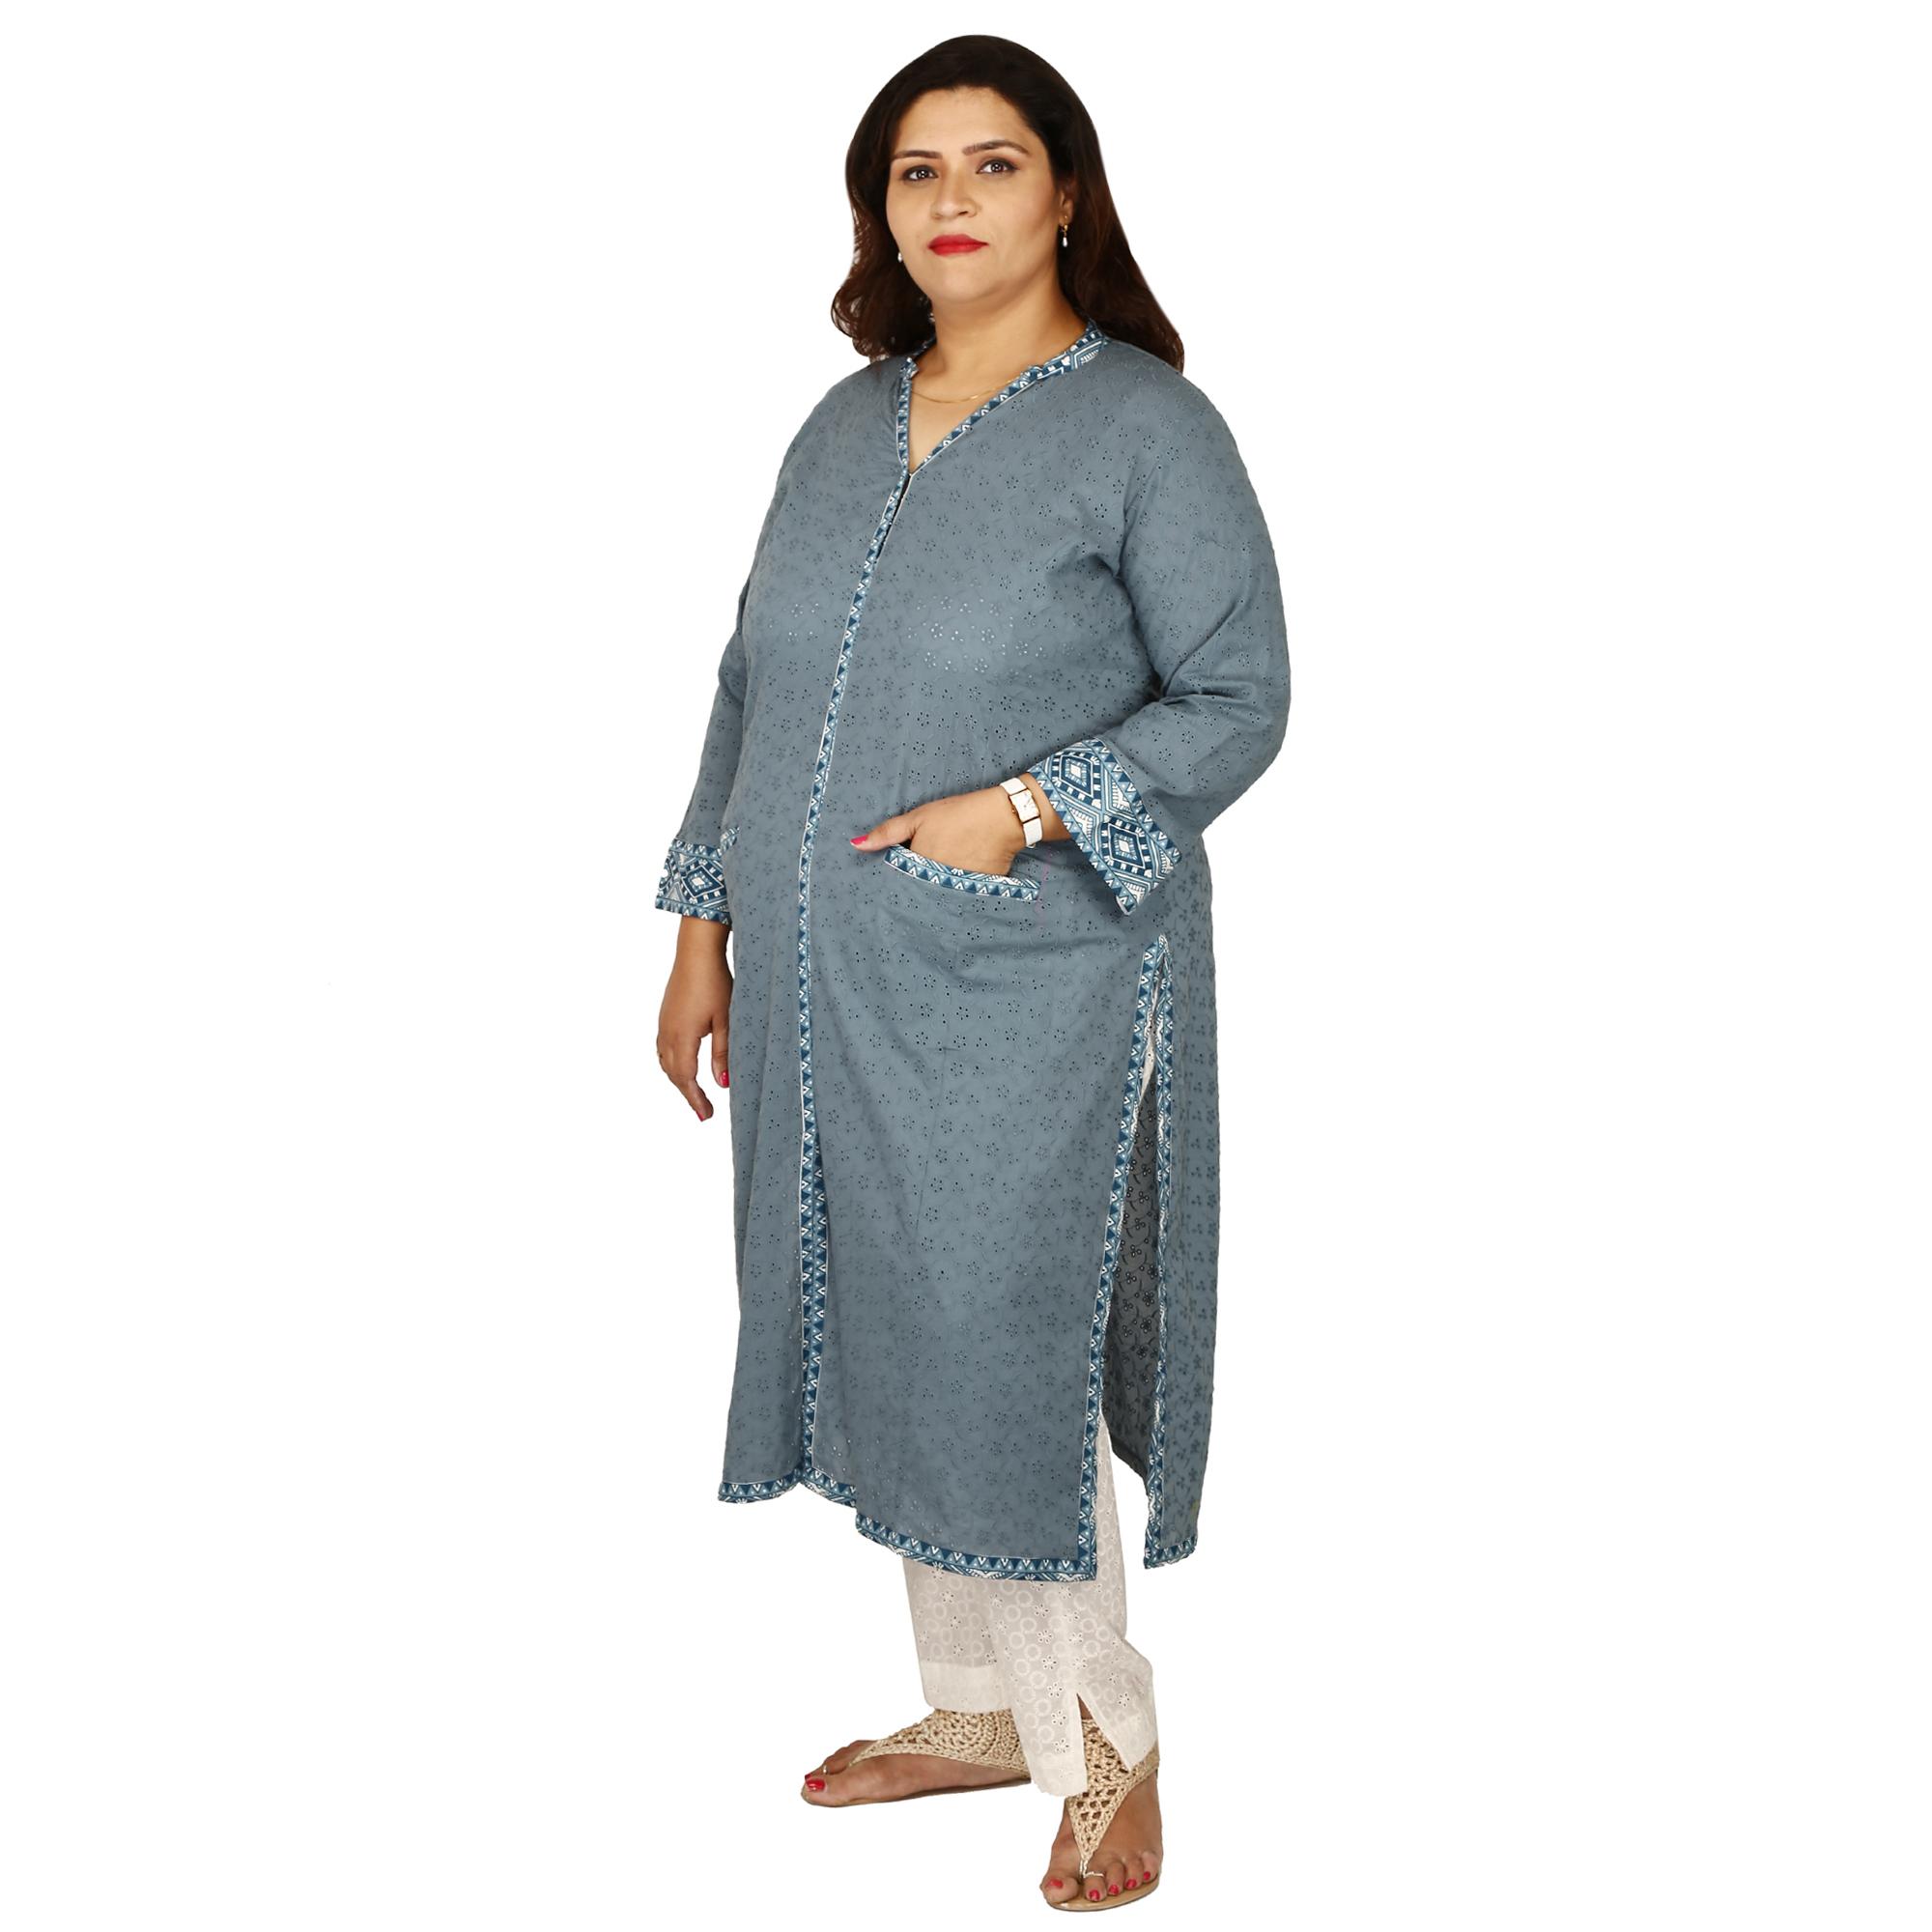 Damyantii Women s Plus Size Cotton Straight Kurti in Chikan ... 1009411d503